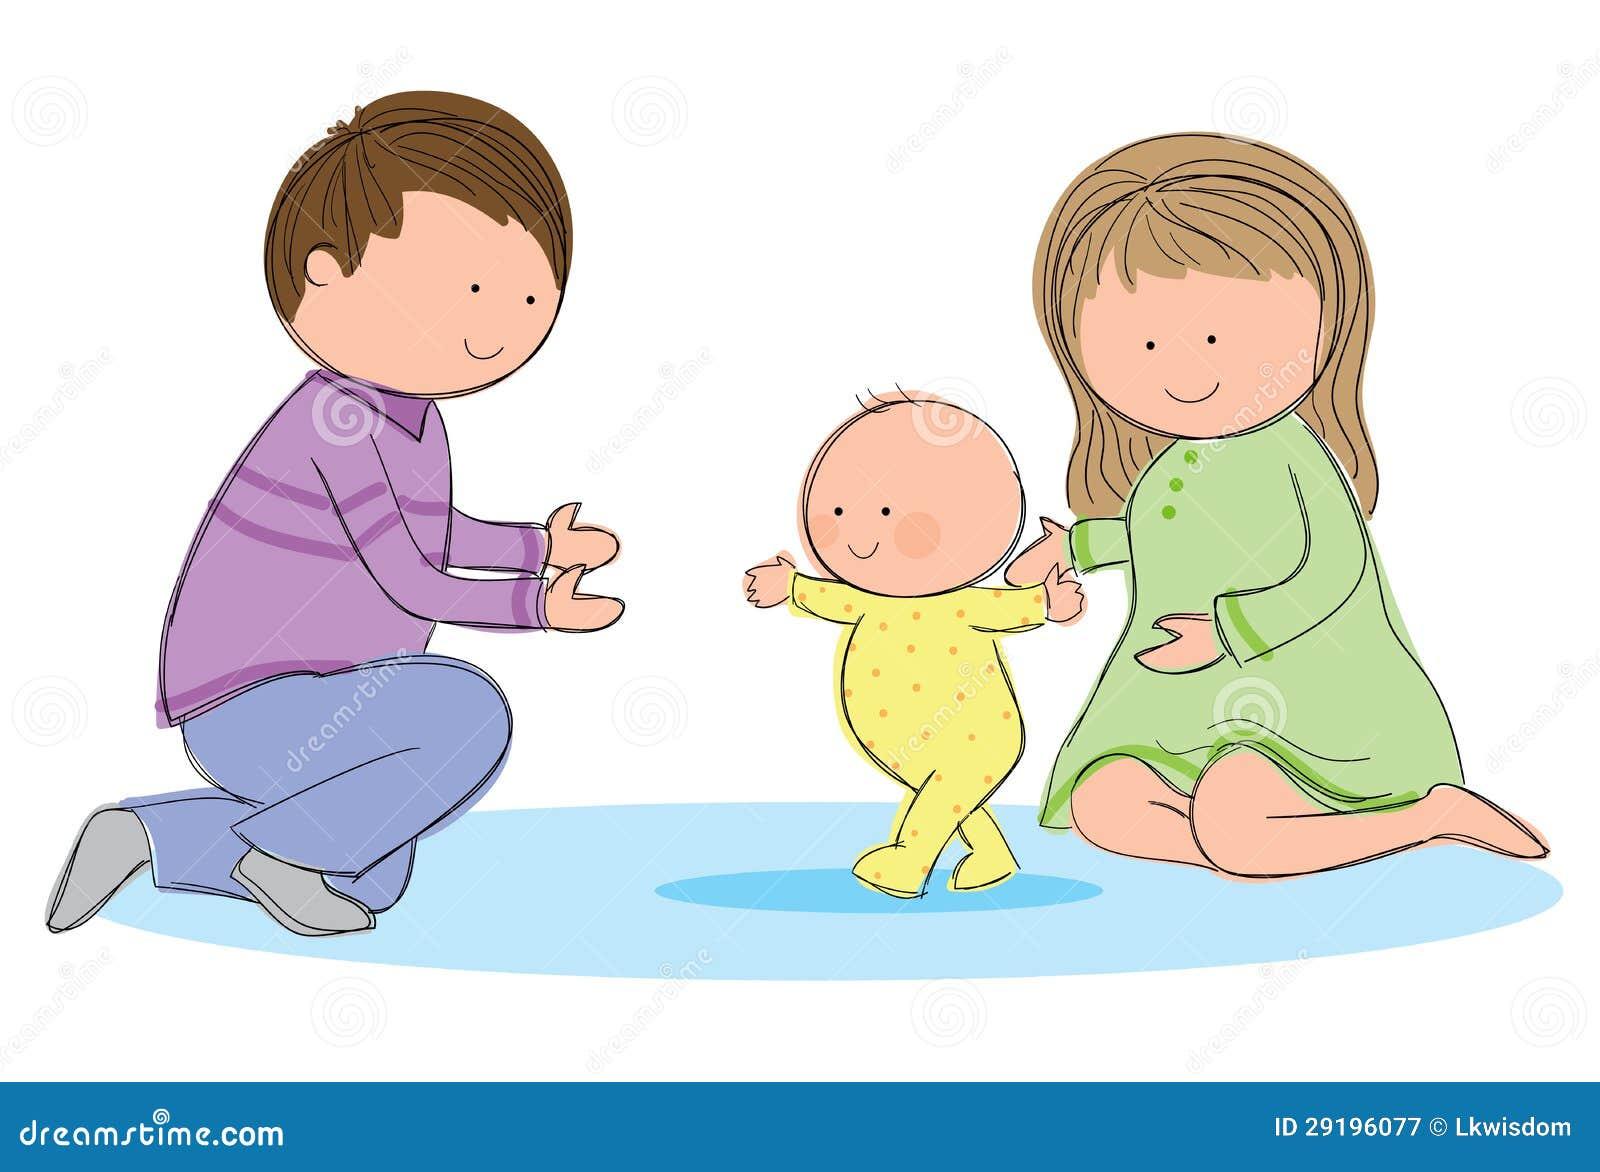 Baby Walking Royalty Free Stock Photography - Image: 29196077